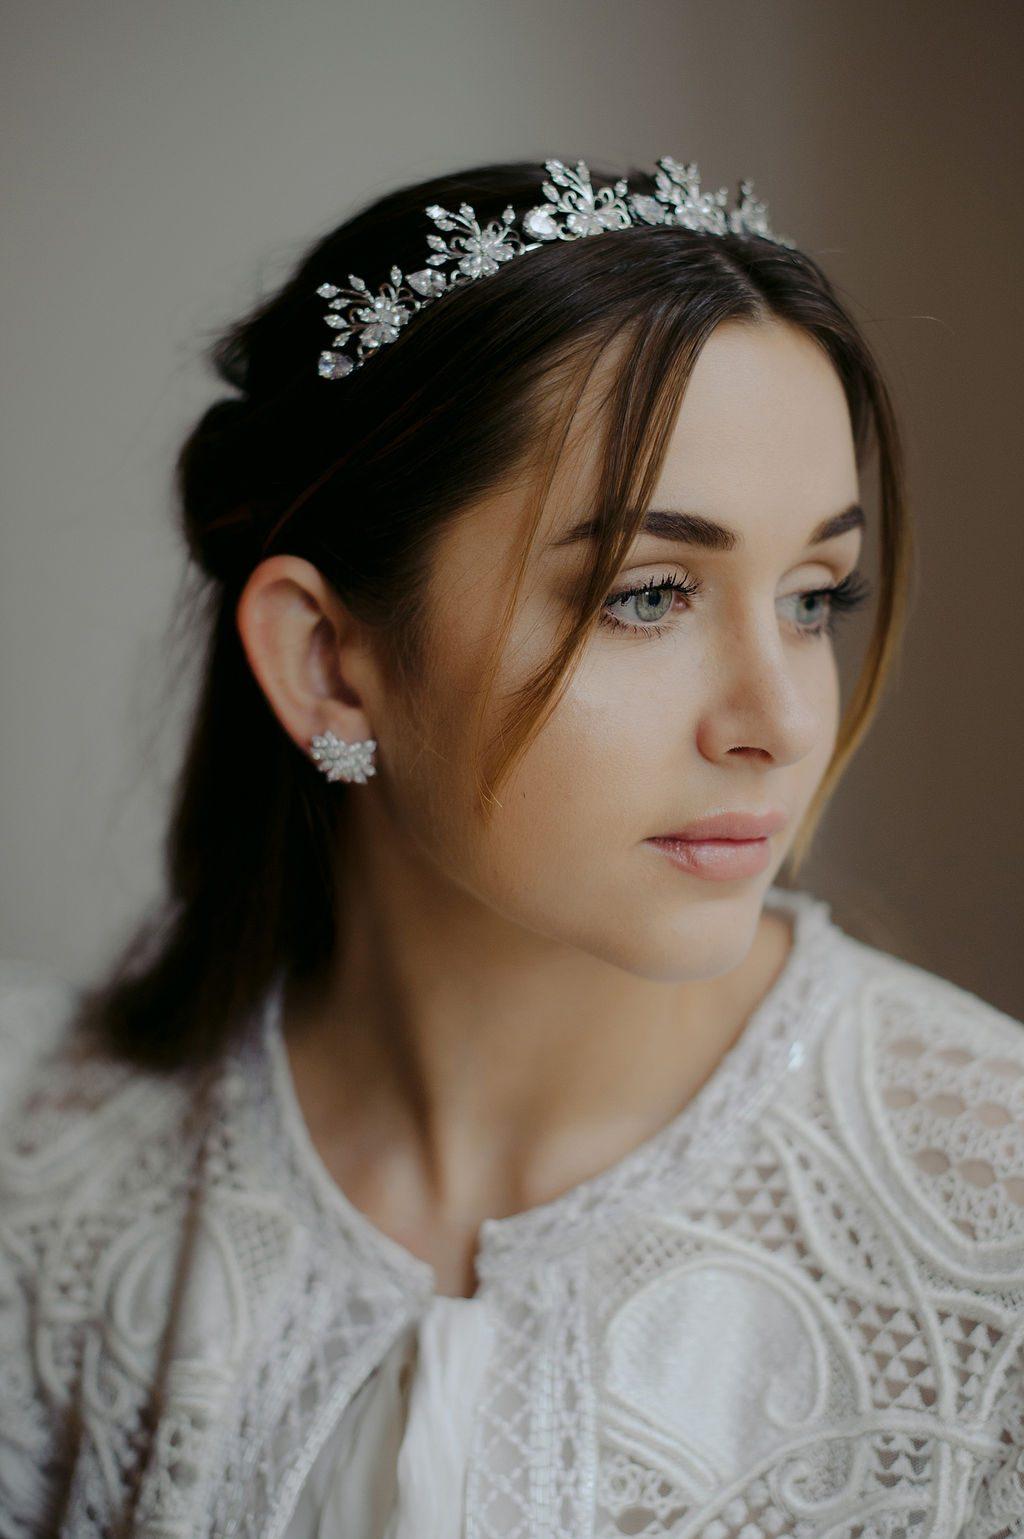 Jeanette Maree — Bridal Hair Tiara